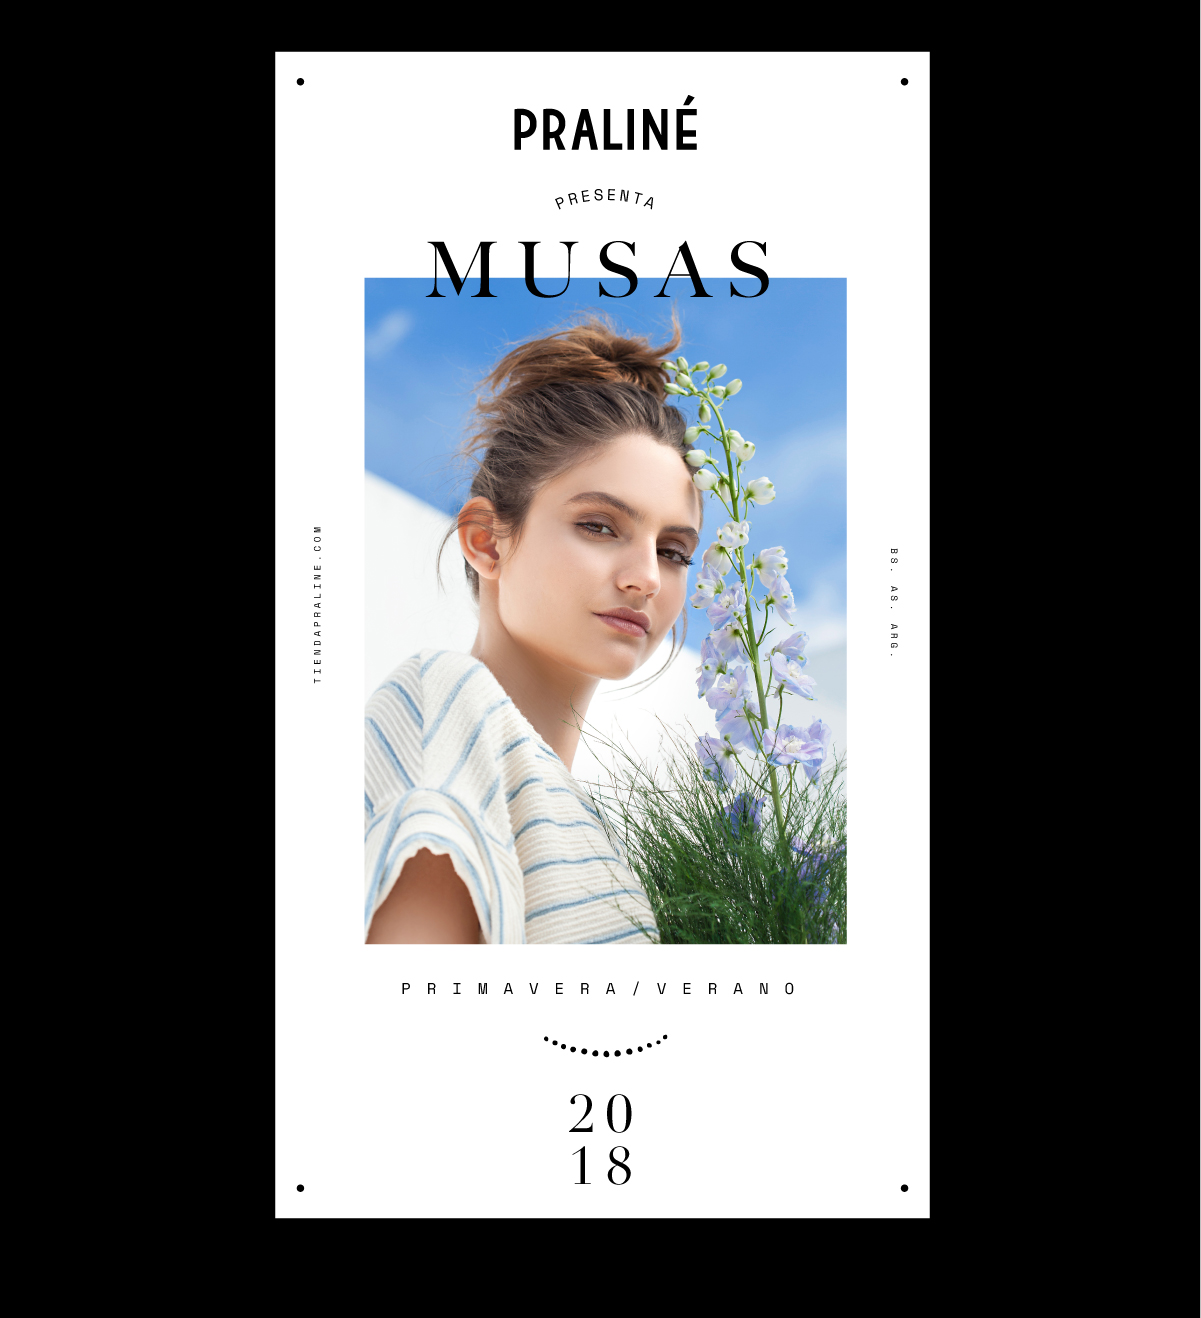 PRALINESS-18-06